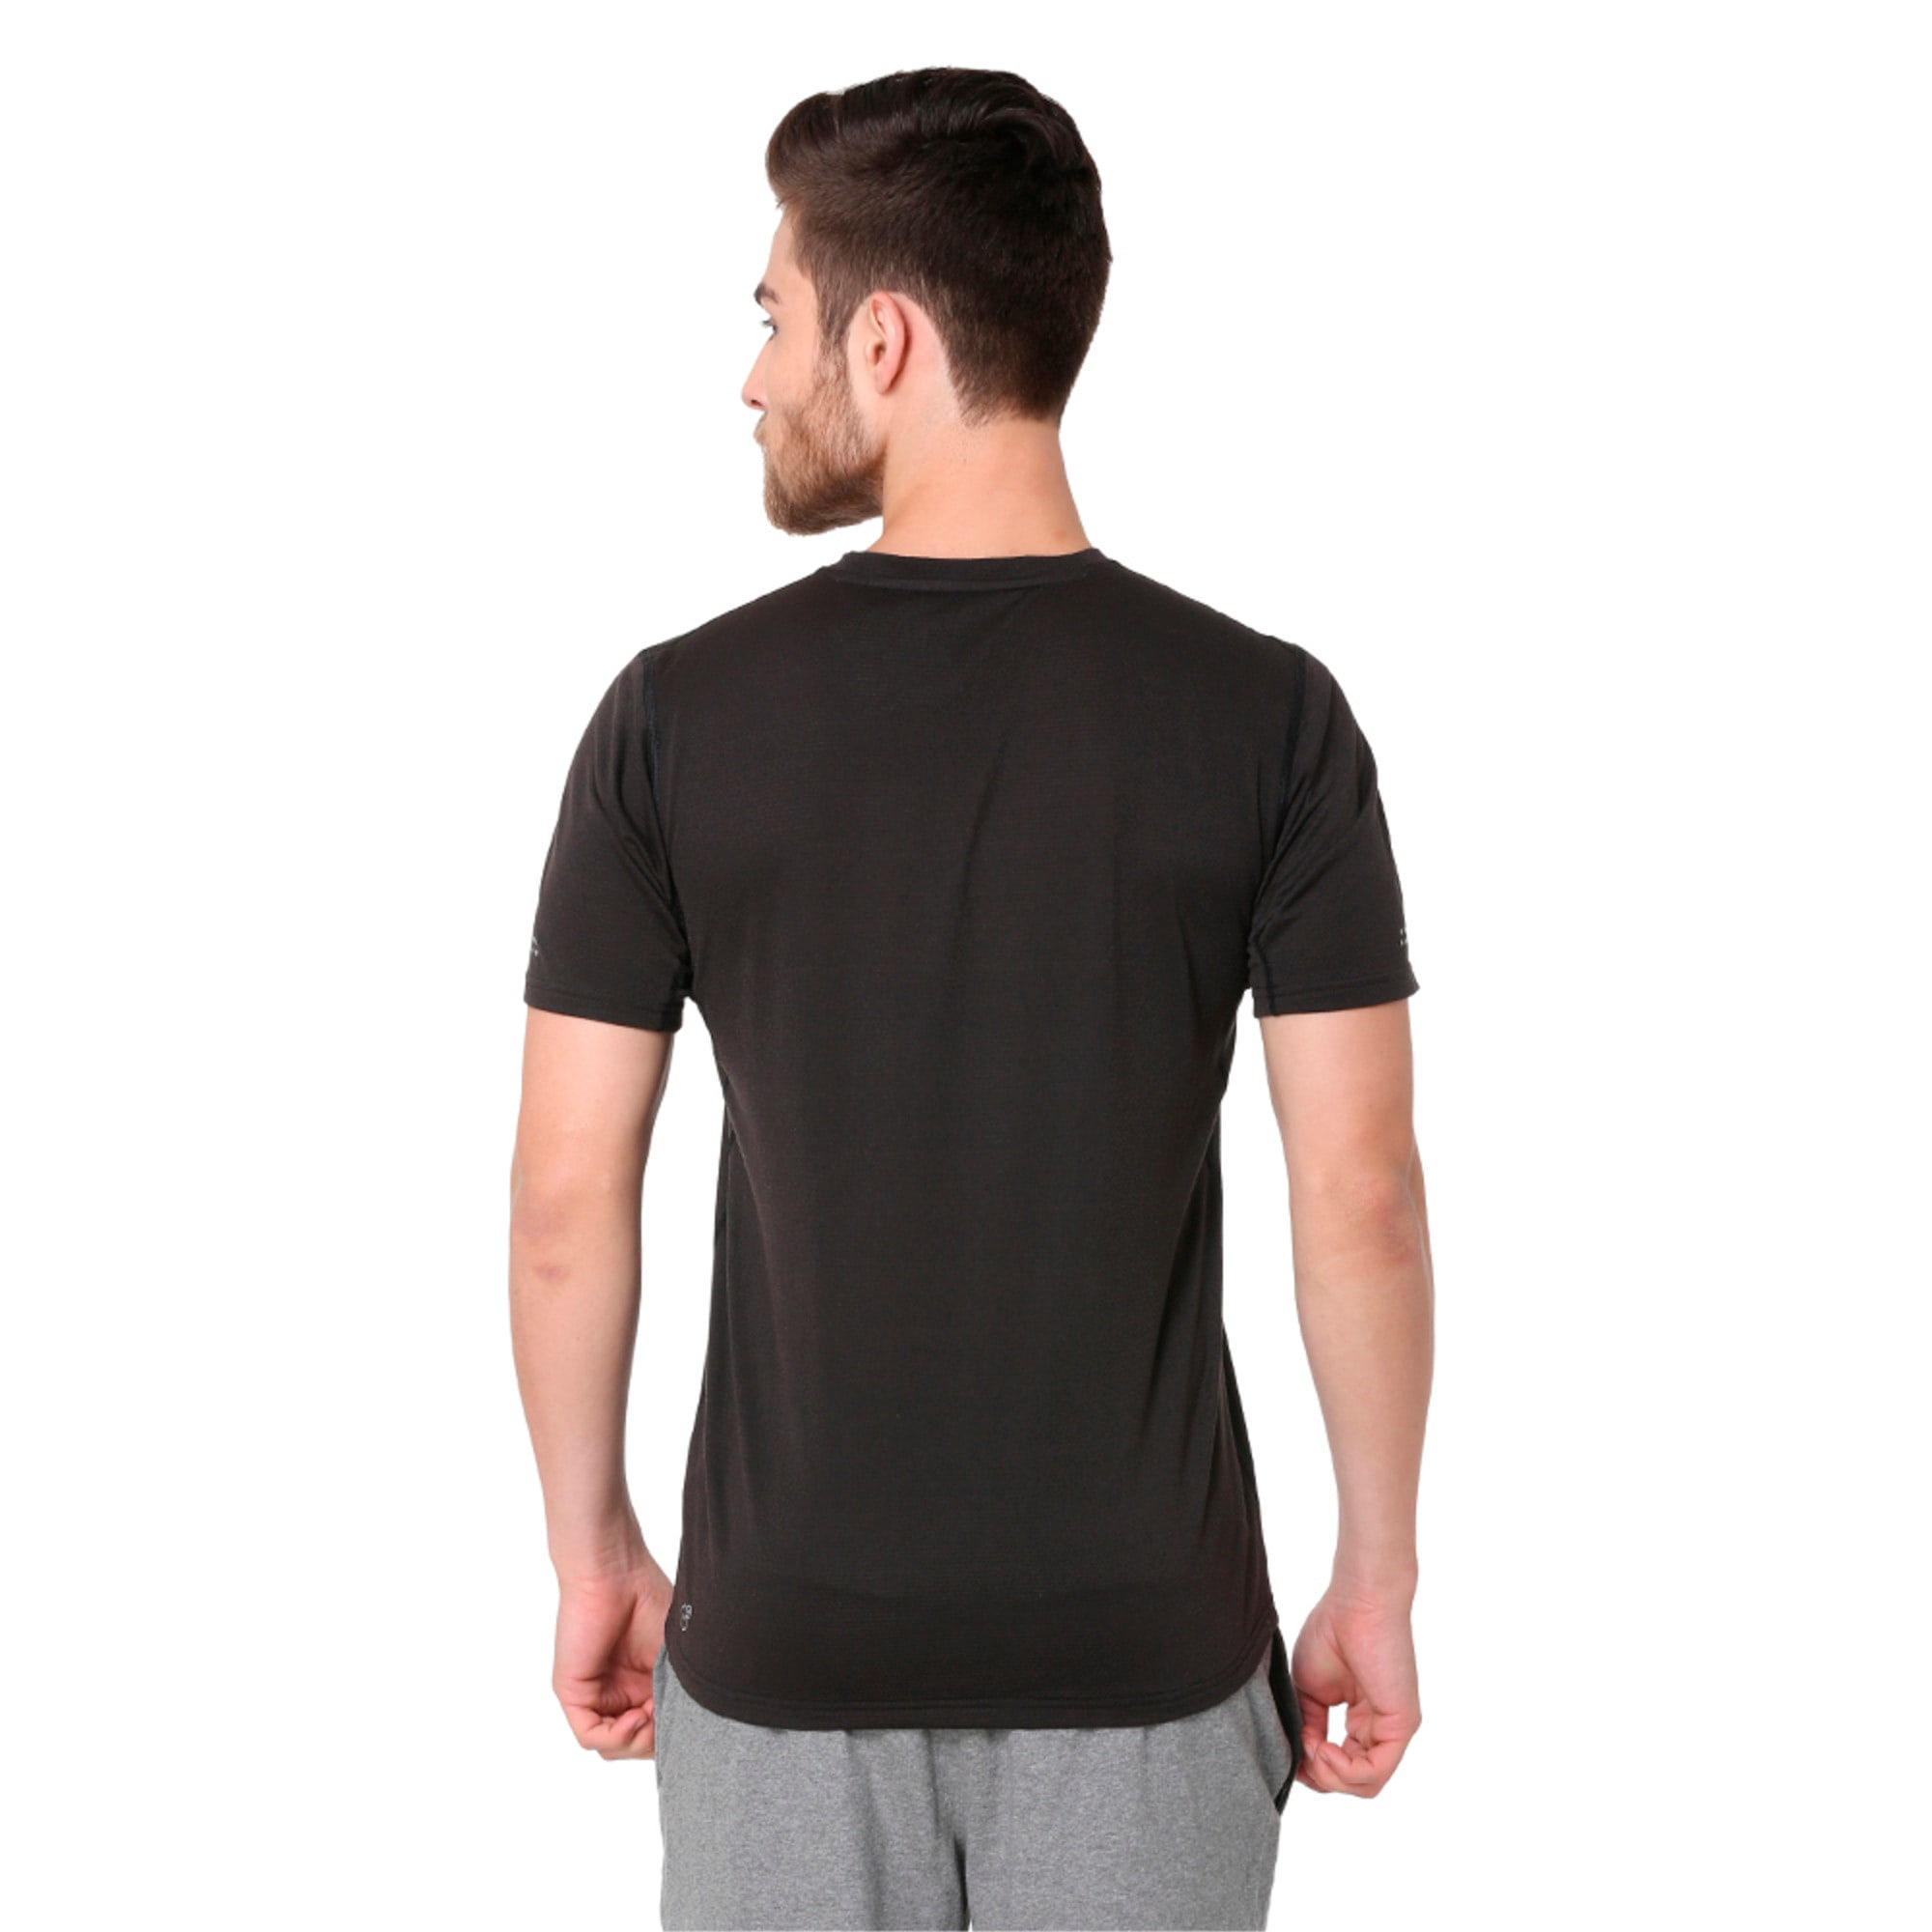 Thumbnail 2 of Run Men's Running T-Shirt, Puma Black, medium-IND